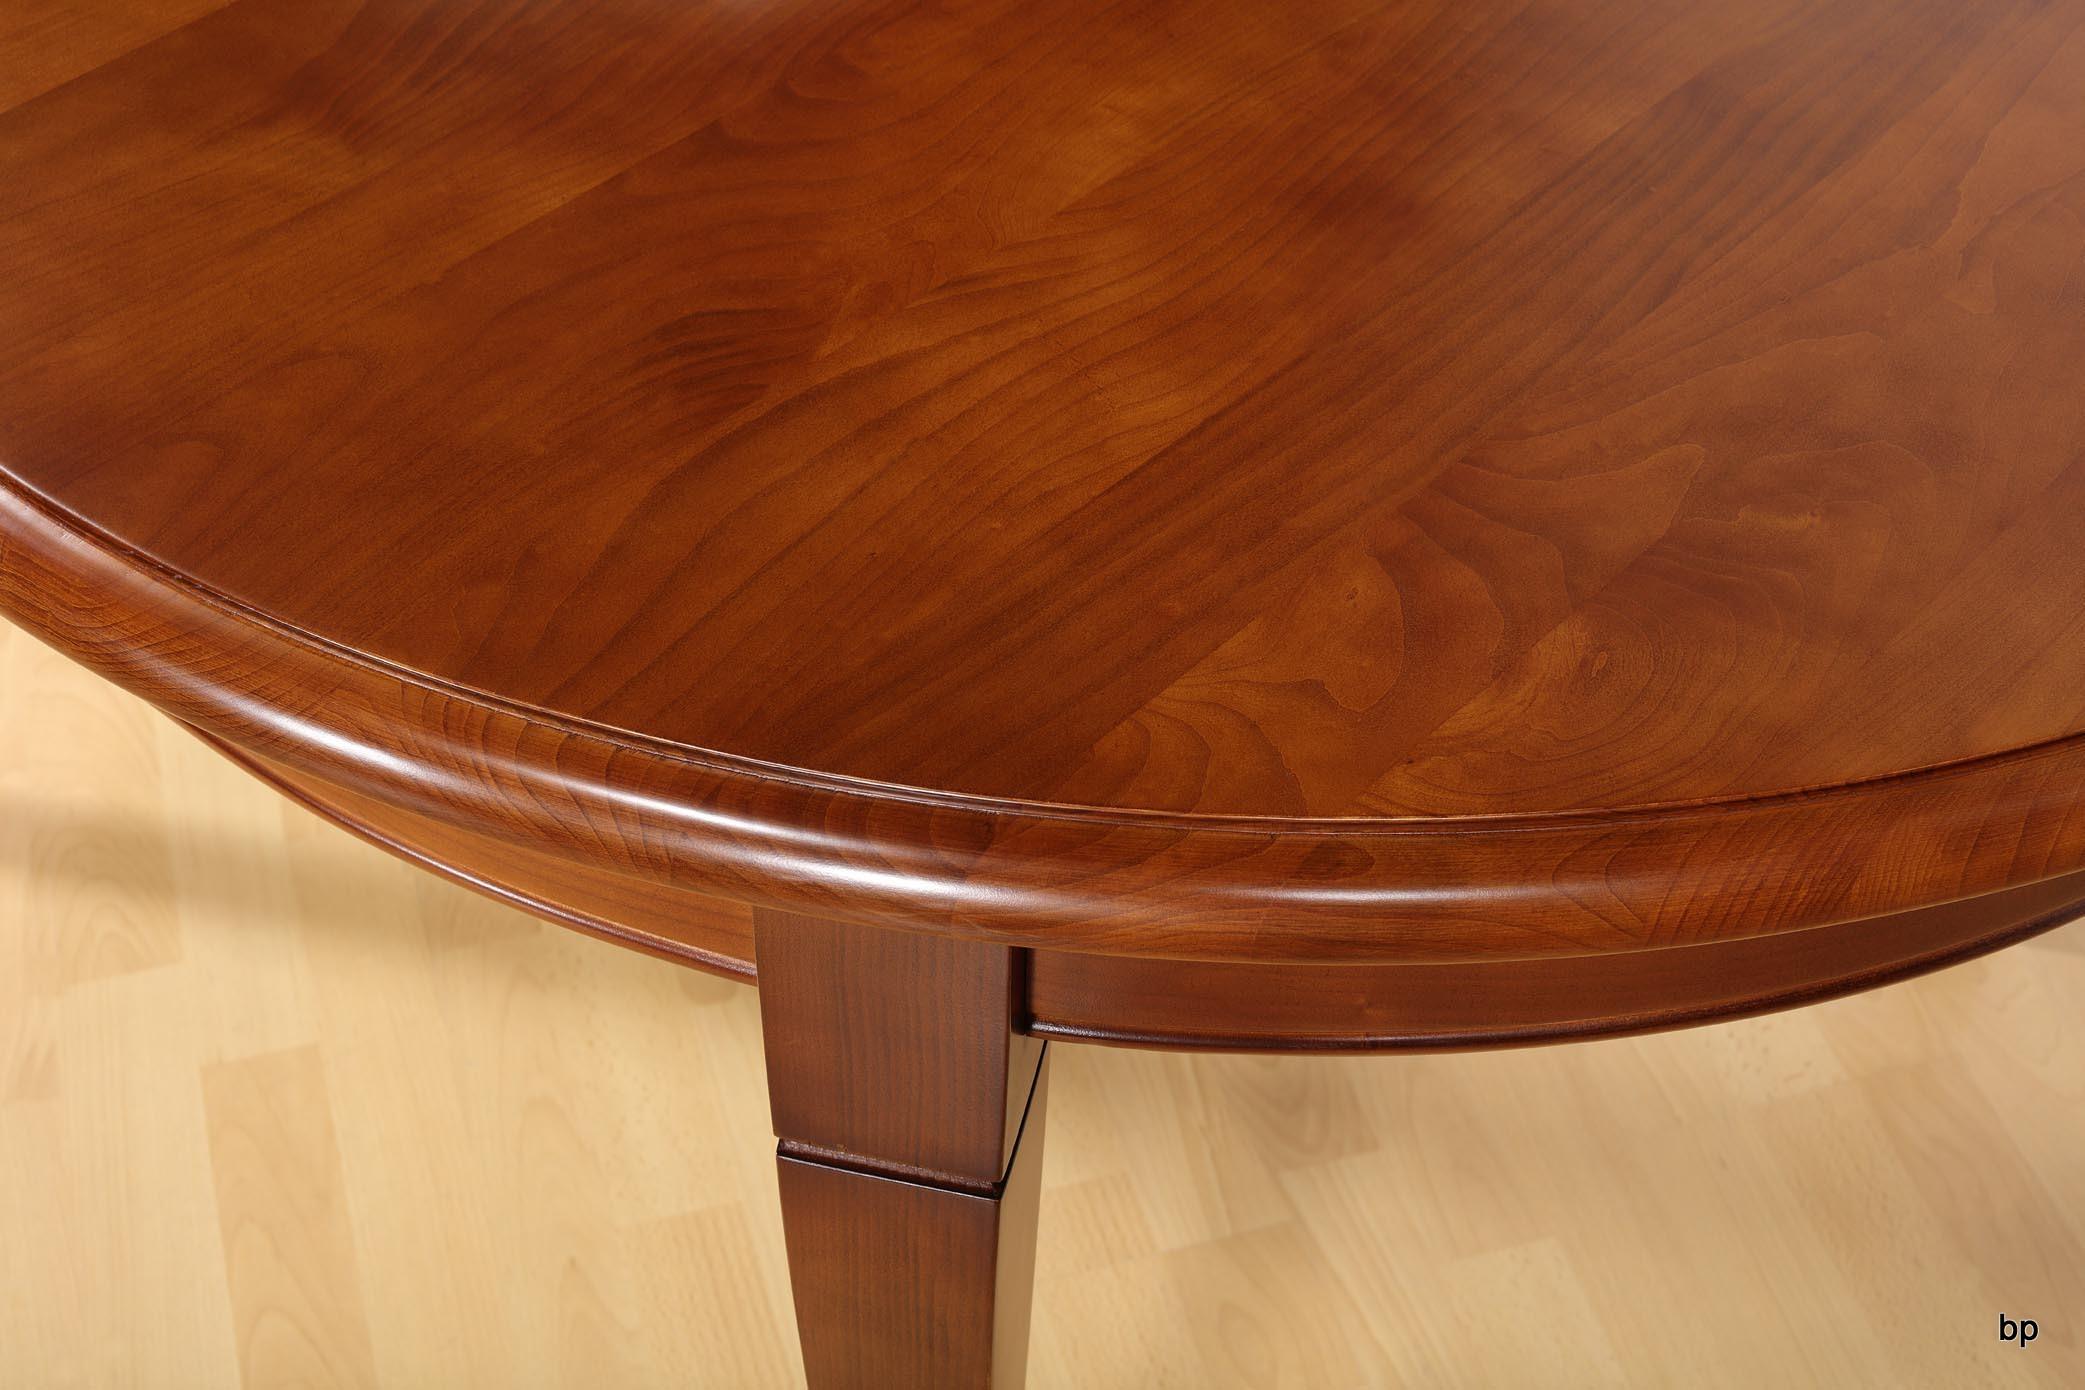 Table ovale de salle manger en merisier massif de style - Salle a manger louis philippe merisier ...